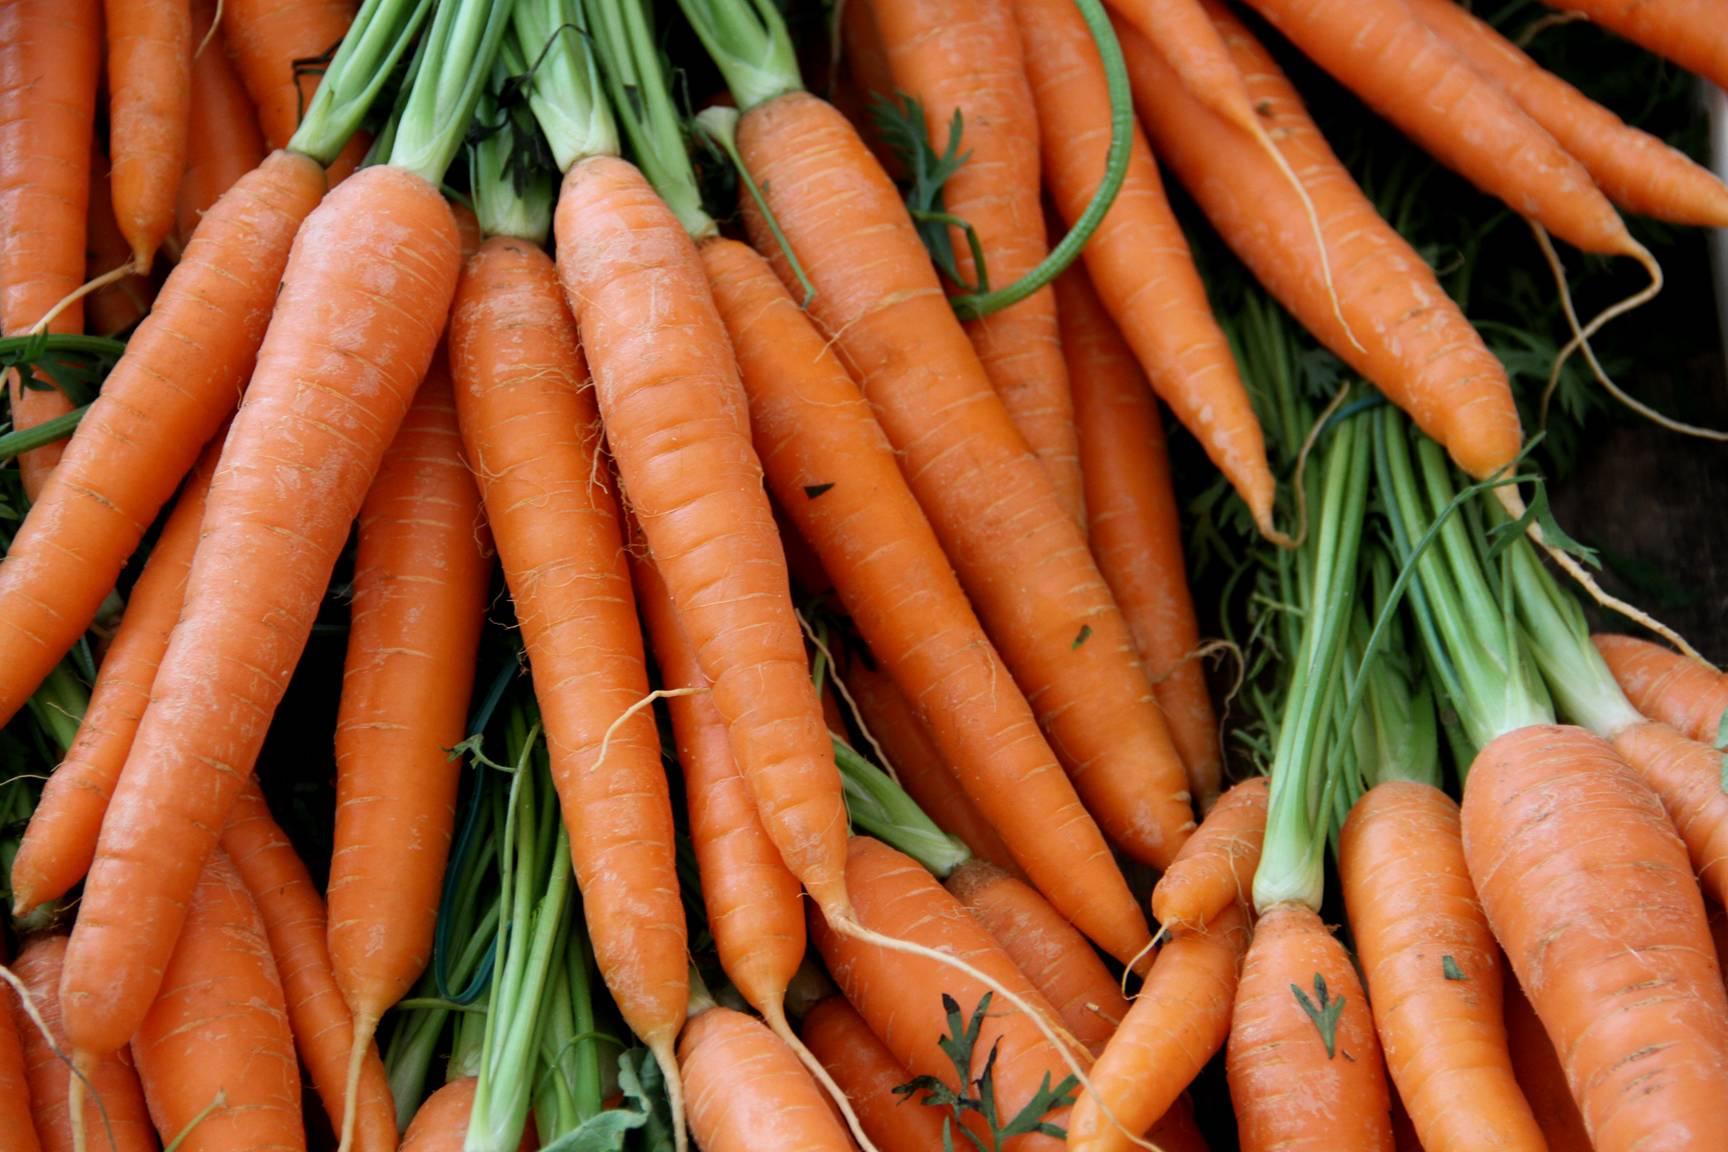 zanahorias fuentes de betacaroteno